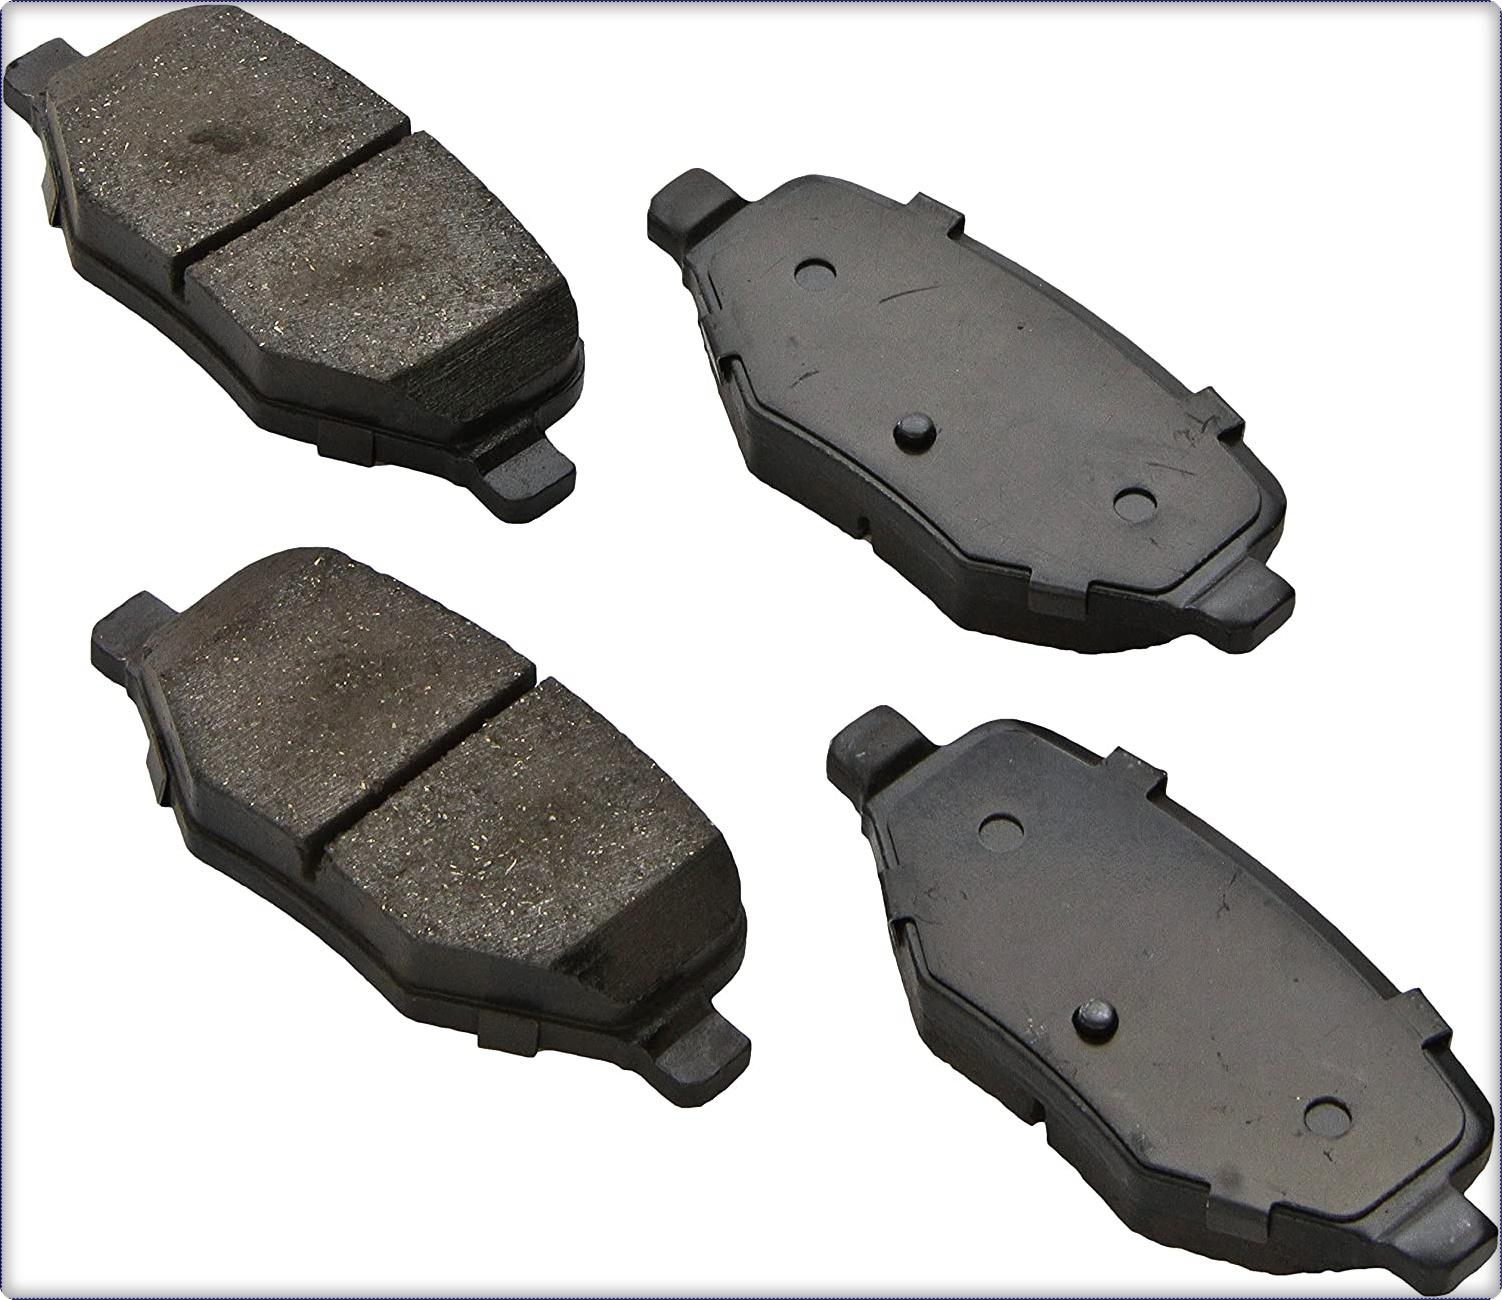 Mâchoires de frein Buick Rainier//CADILLAC DTS//Escalade//Chevrolet Astro//Avalanche